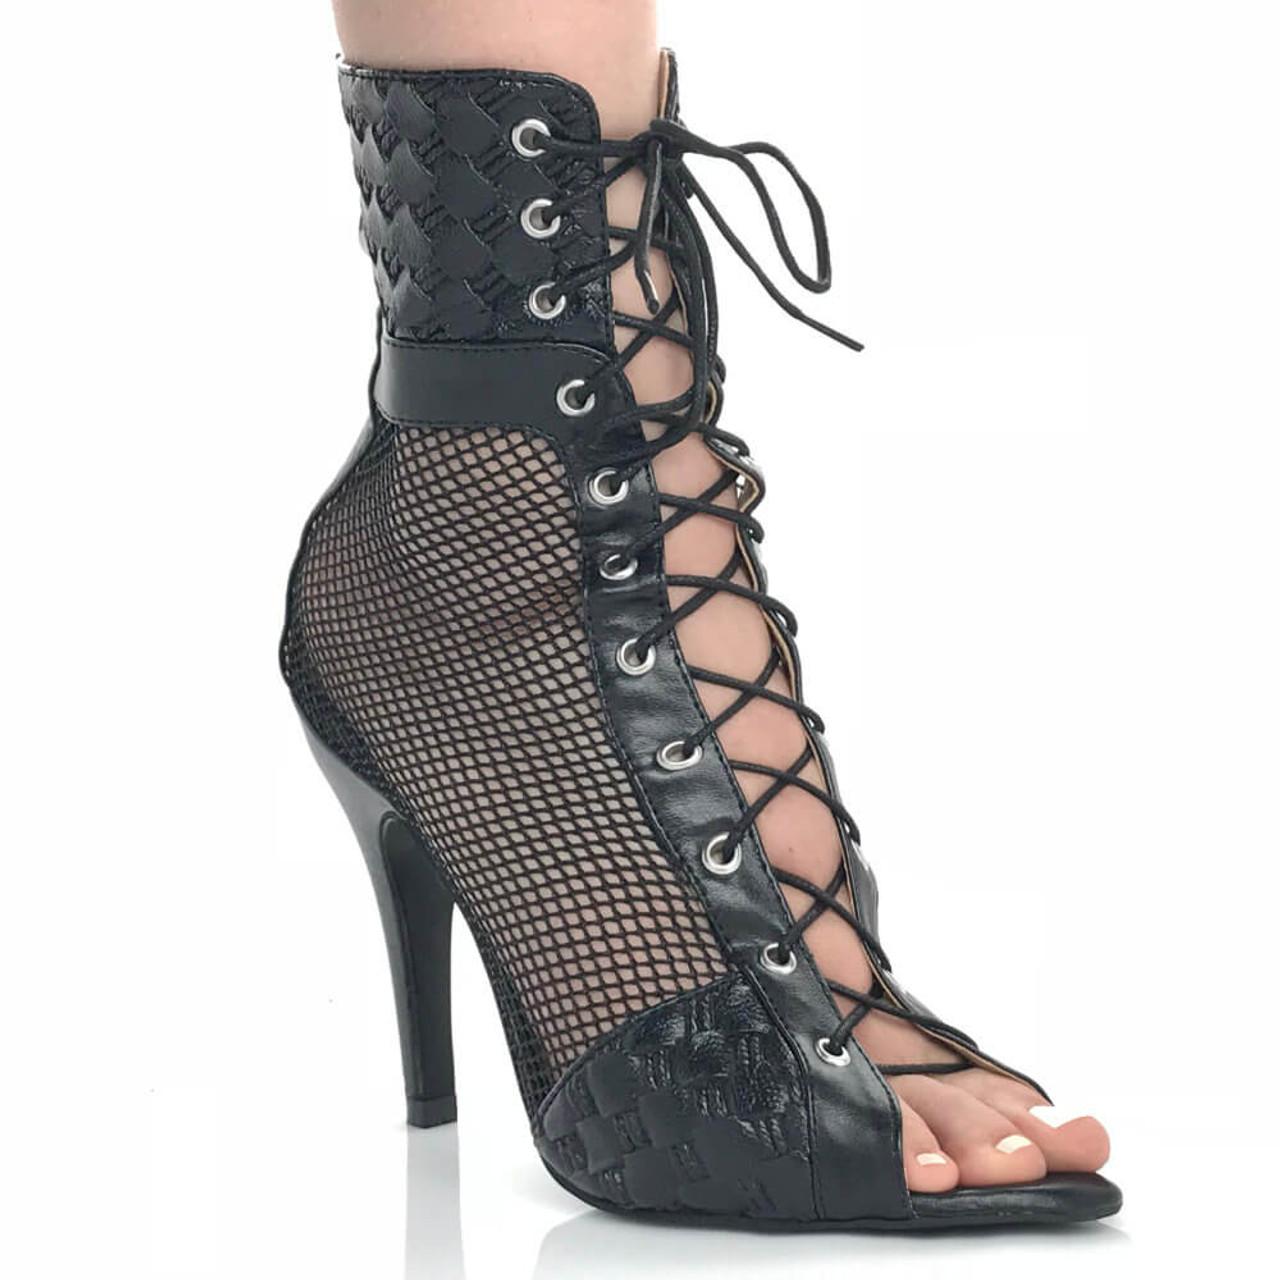 Open Toe Lace Up Bootie - Burju Shoes